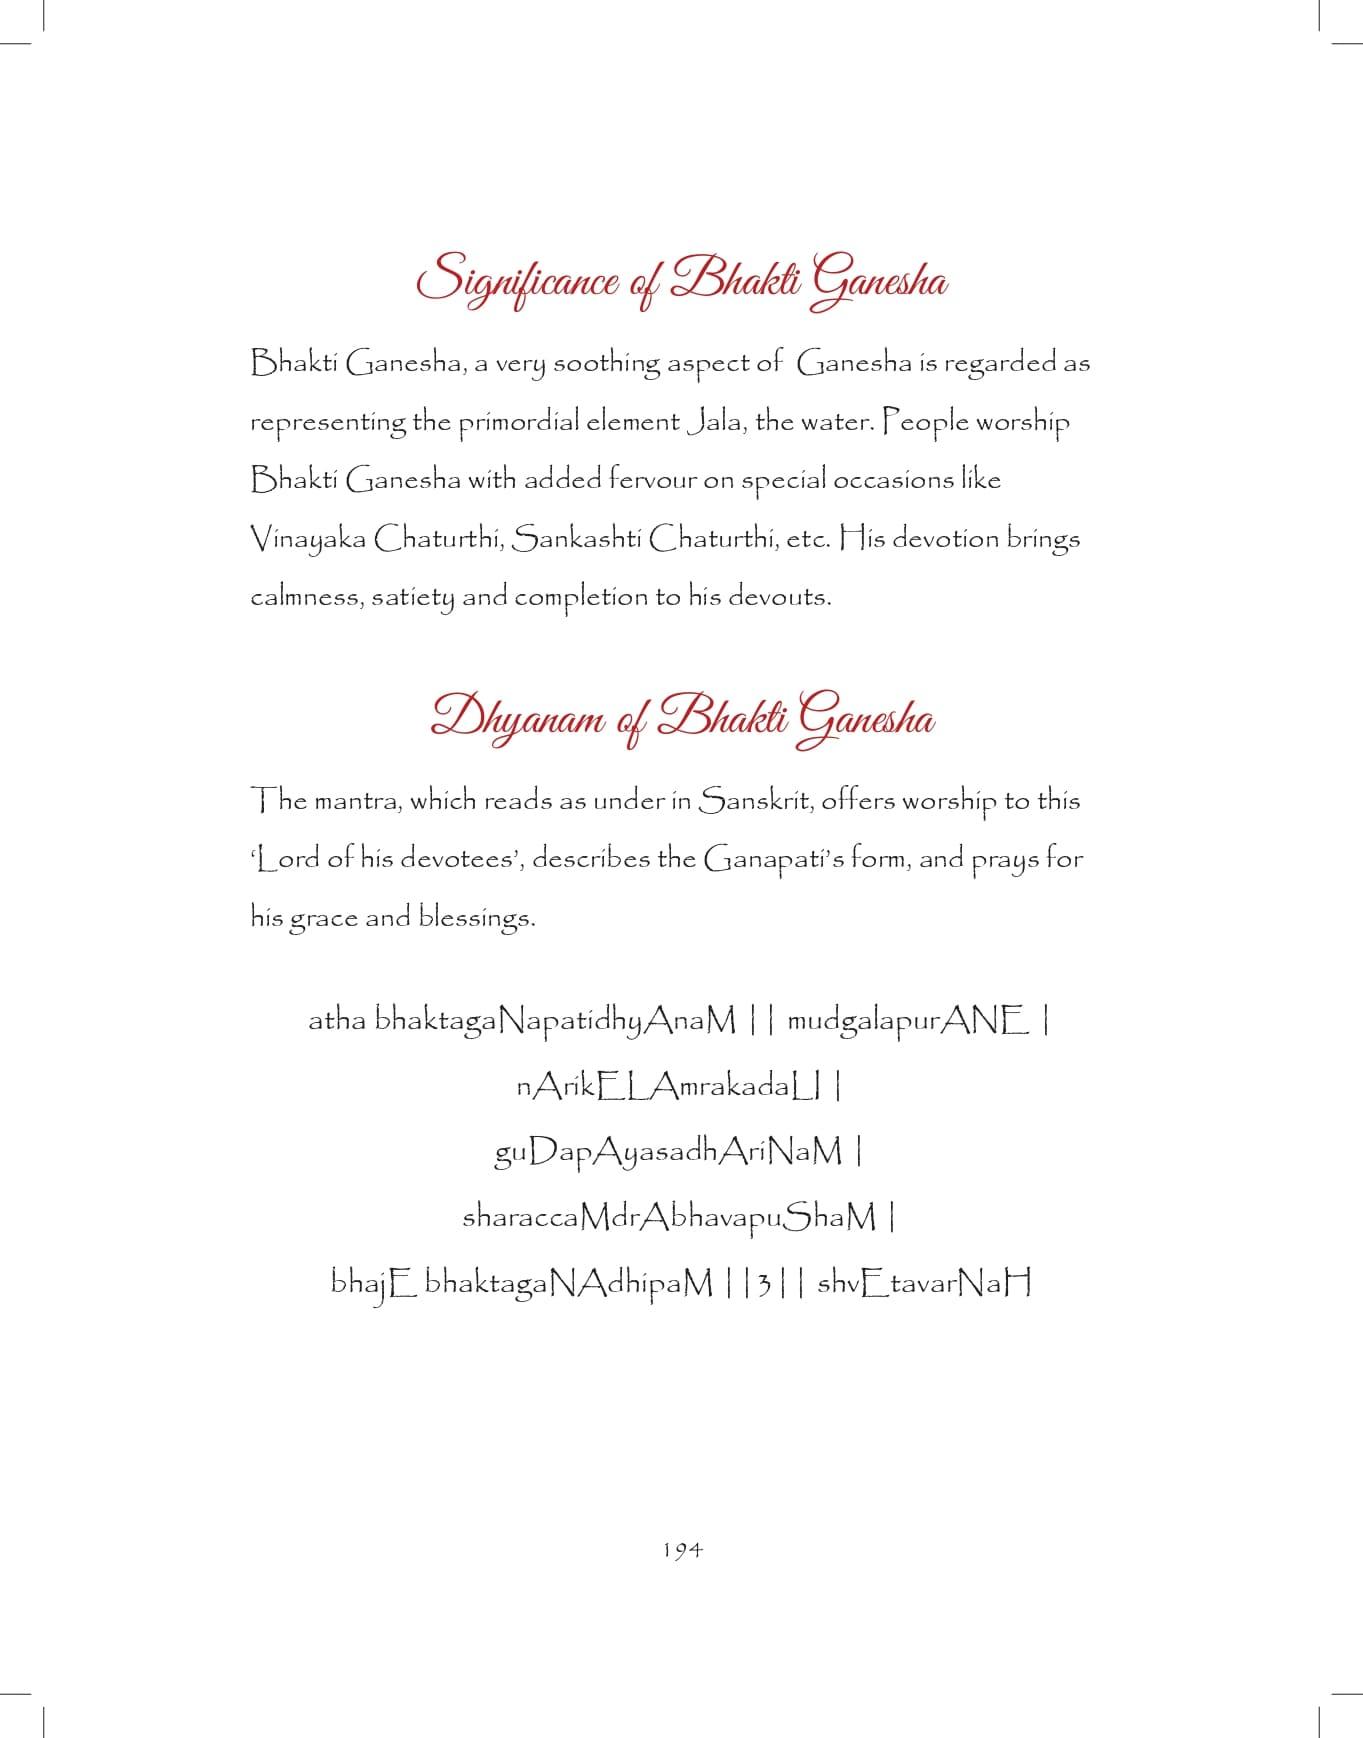 Ganesh-print_pages-to-jpg-0194.jpg